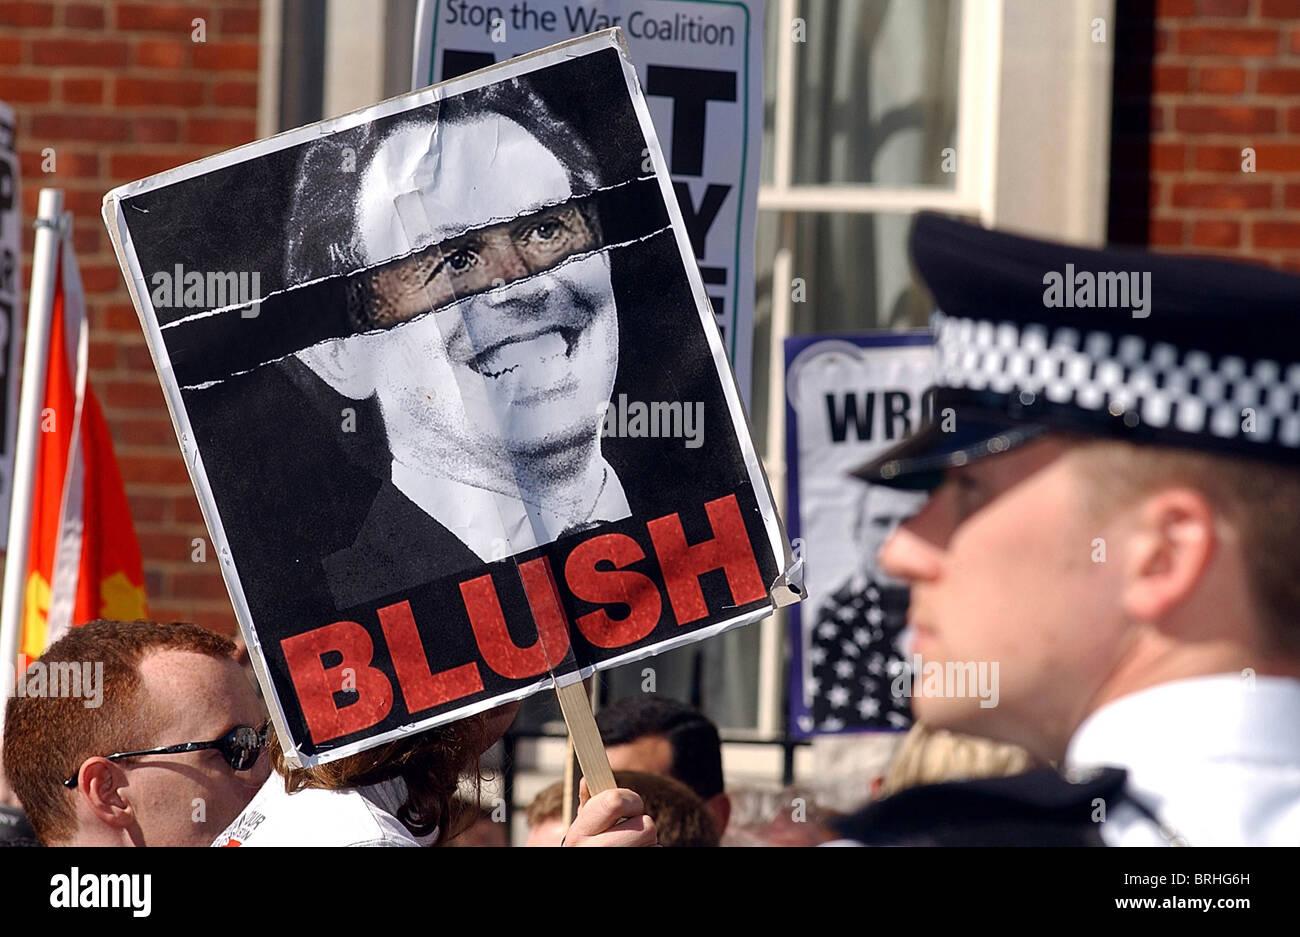 L'anti-war demo dans Grosvenor Square, London, 5-4-2003. Photo de John Robertson-Tel.07850 931219. Photo Stock